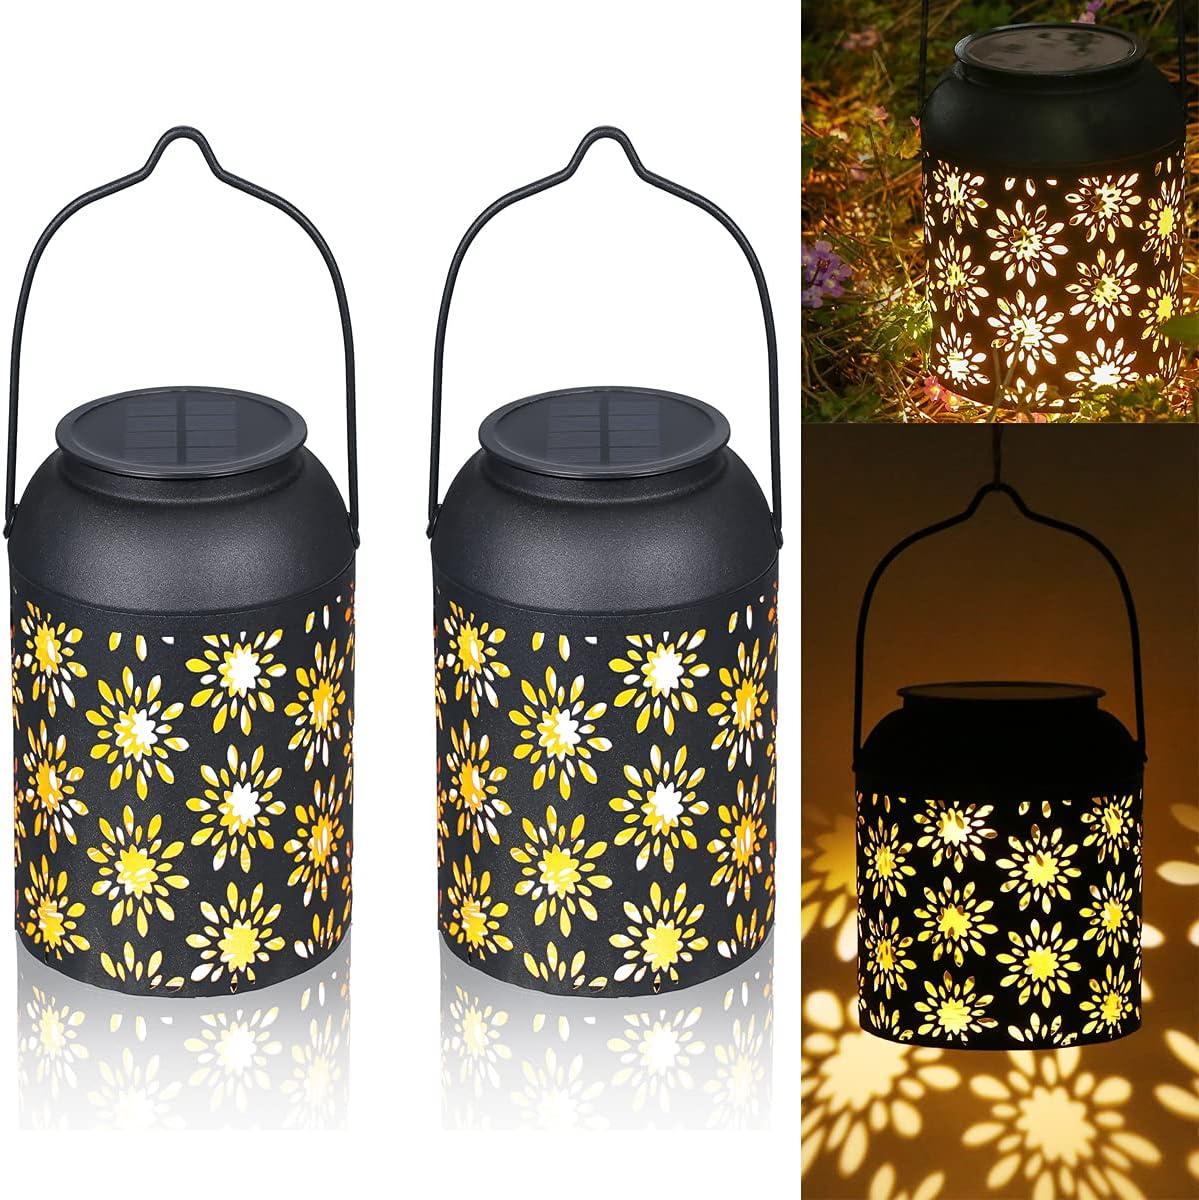 Max 54% OFF Tom-shine 2 Pack Hanging favorite Solar Outdoor Lantern Lanterns Lights